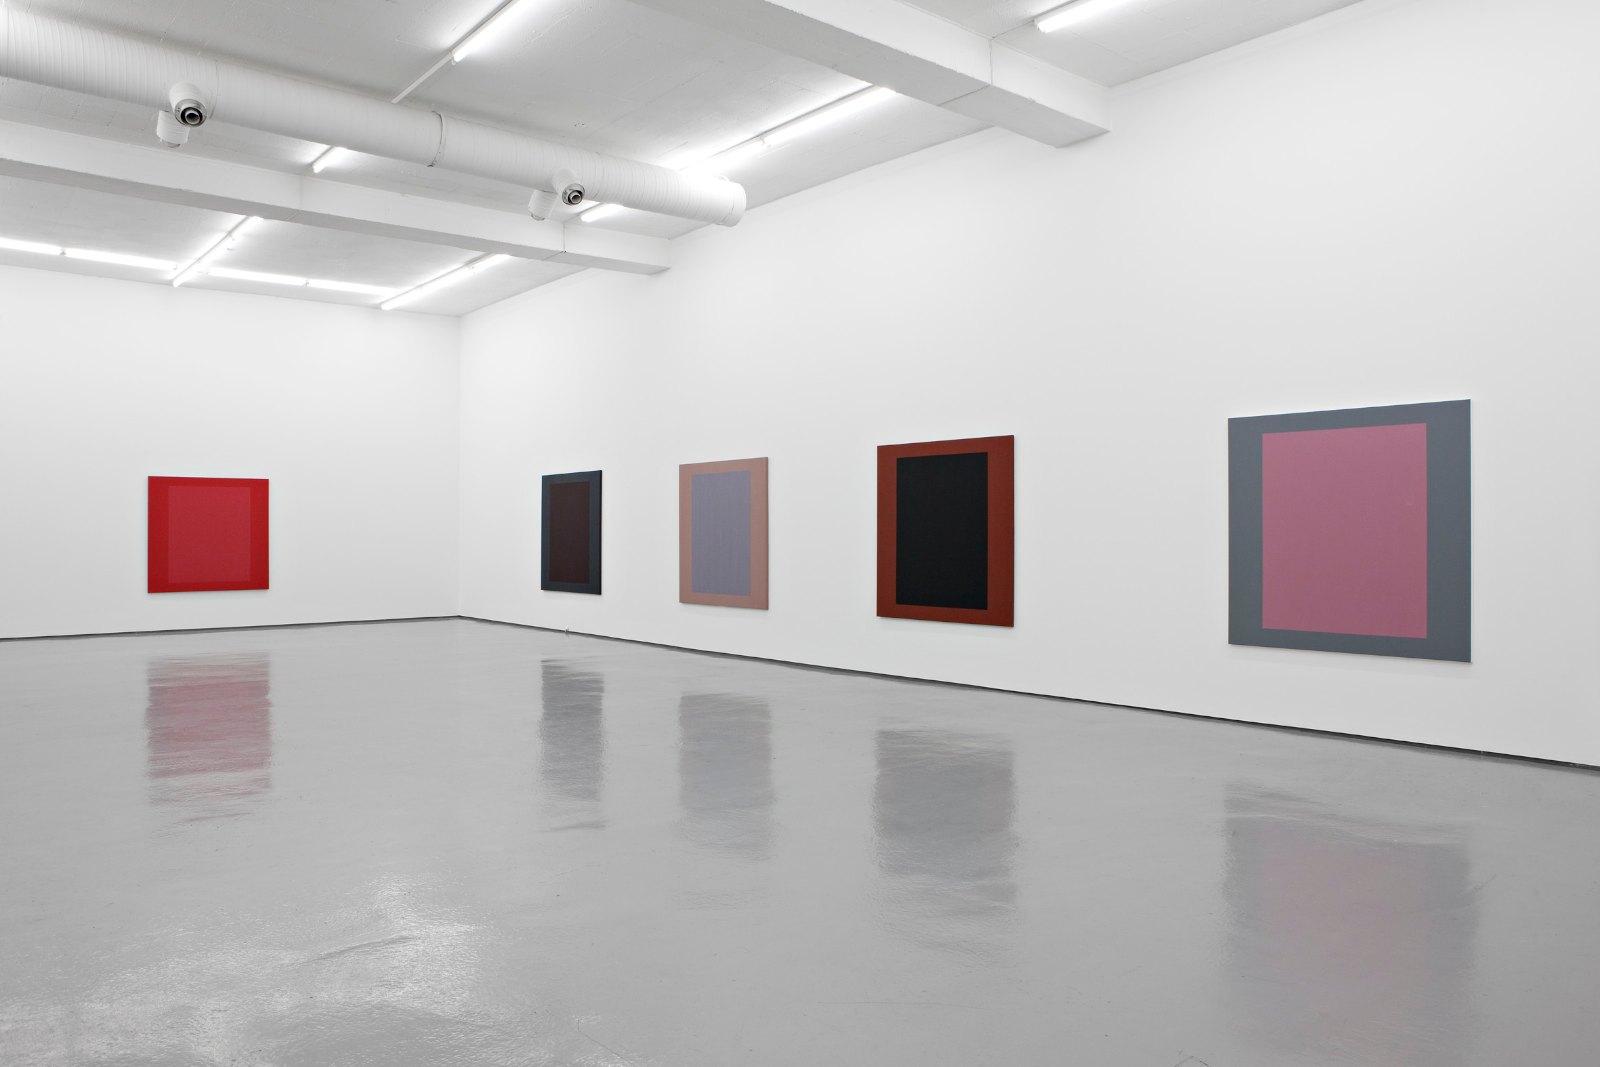 Installation view, Galleri Riis, Oslo, 2011